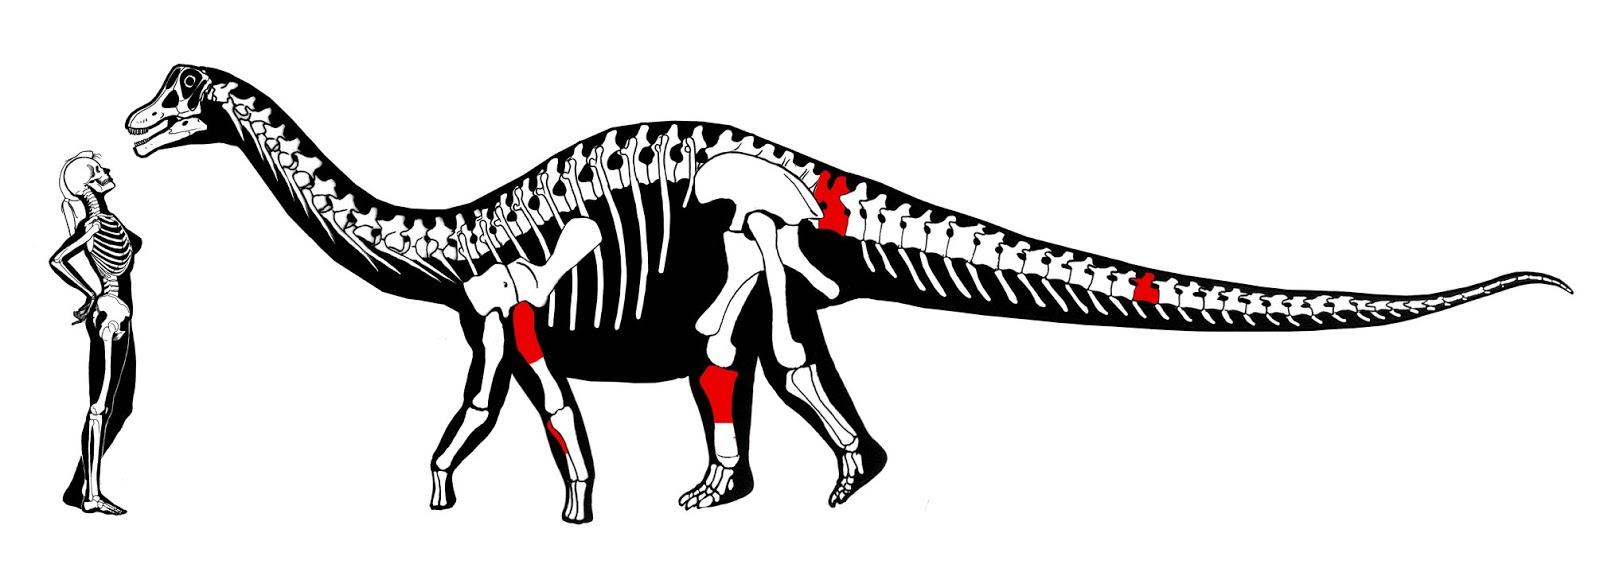 yamanasaurus_csontvazanak_rekonstrukcioja_sebastian_apesteguia_tarsai.jpg